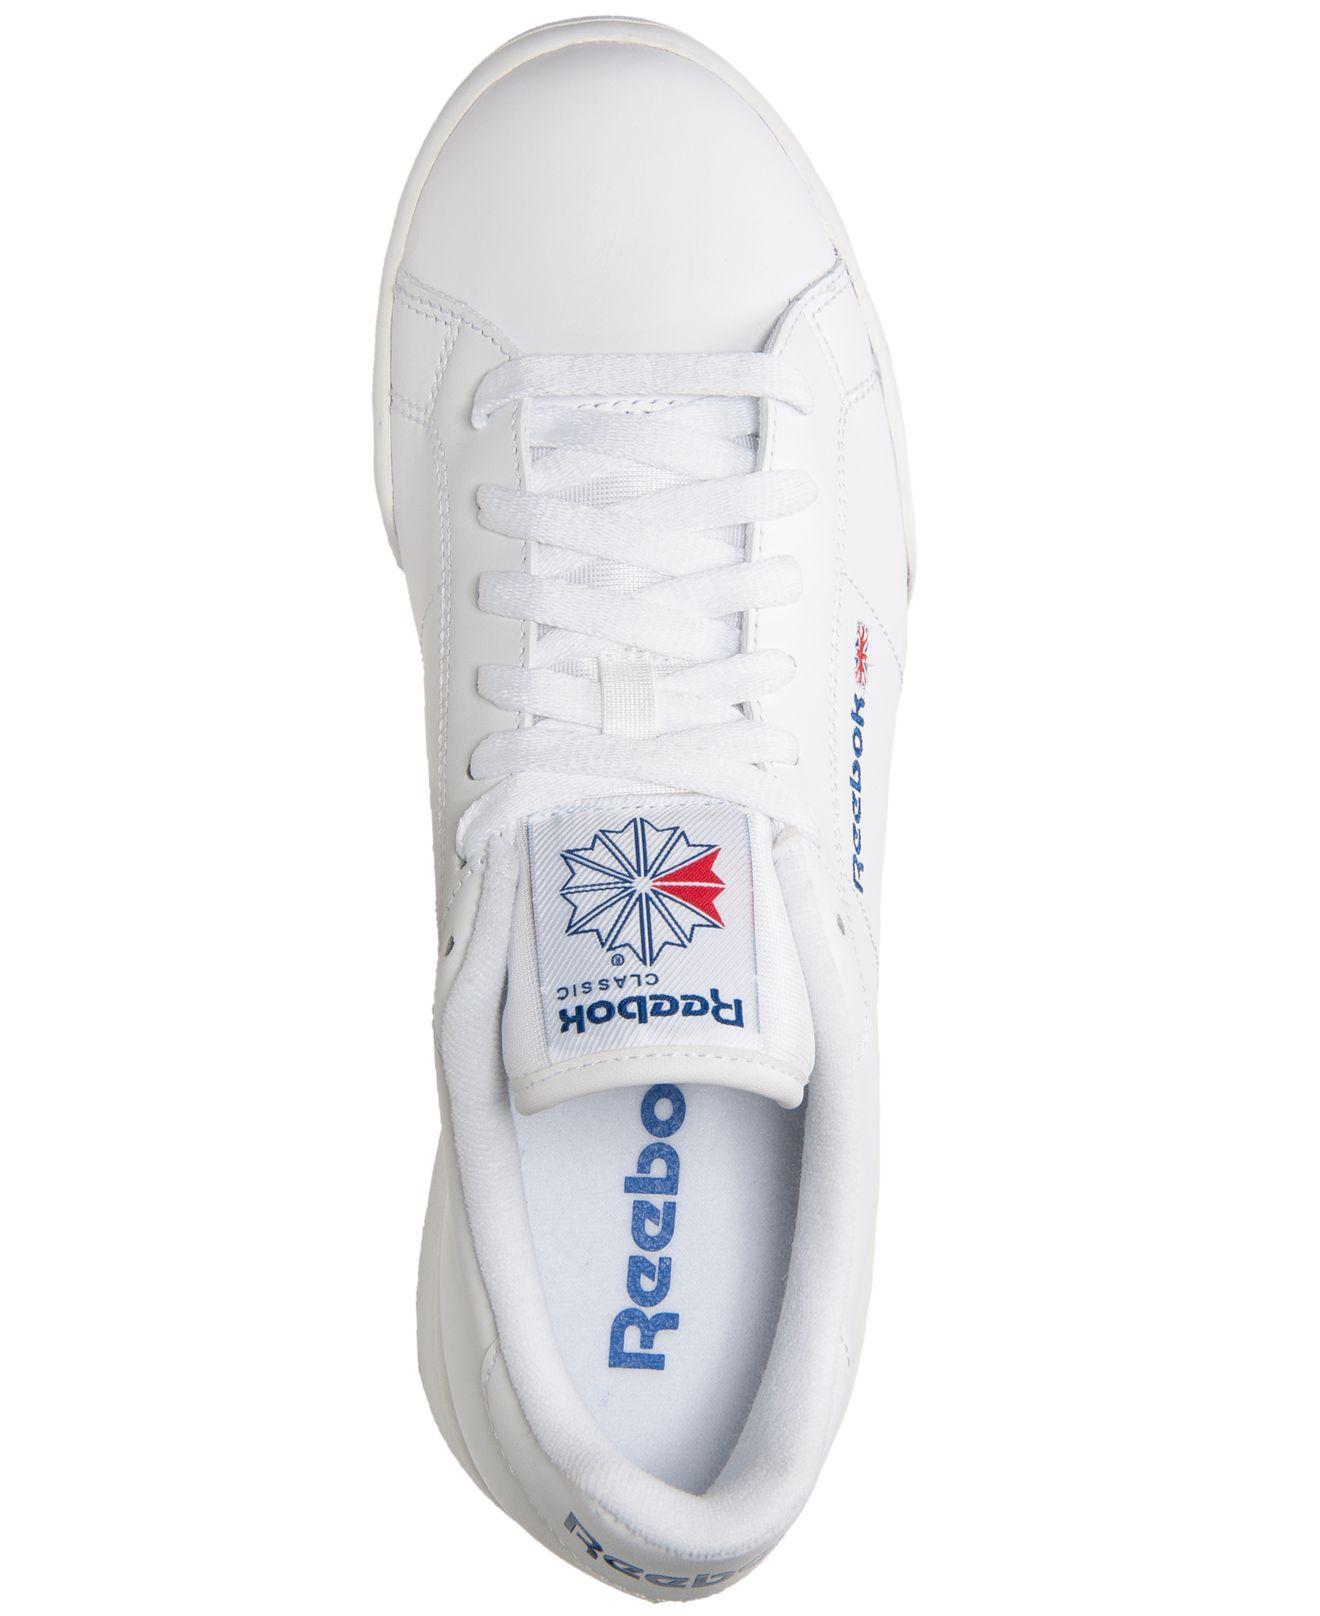 Lyst - Reebok Men s Npc Ii Casual Sneakers From Finish Line in White ... 042c7a6d6